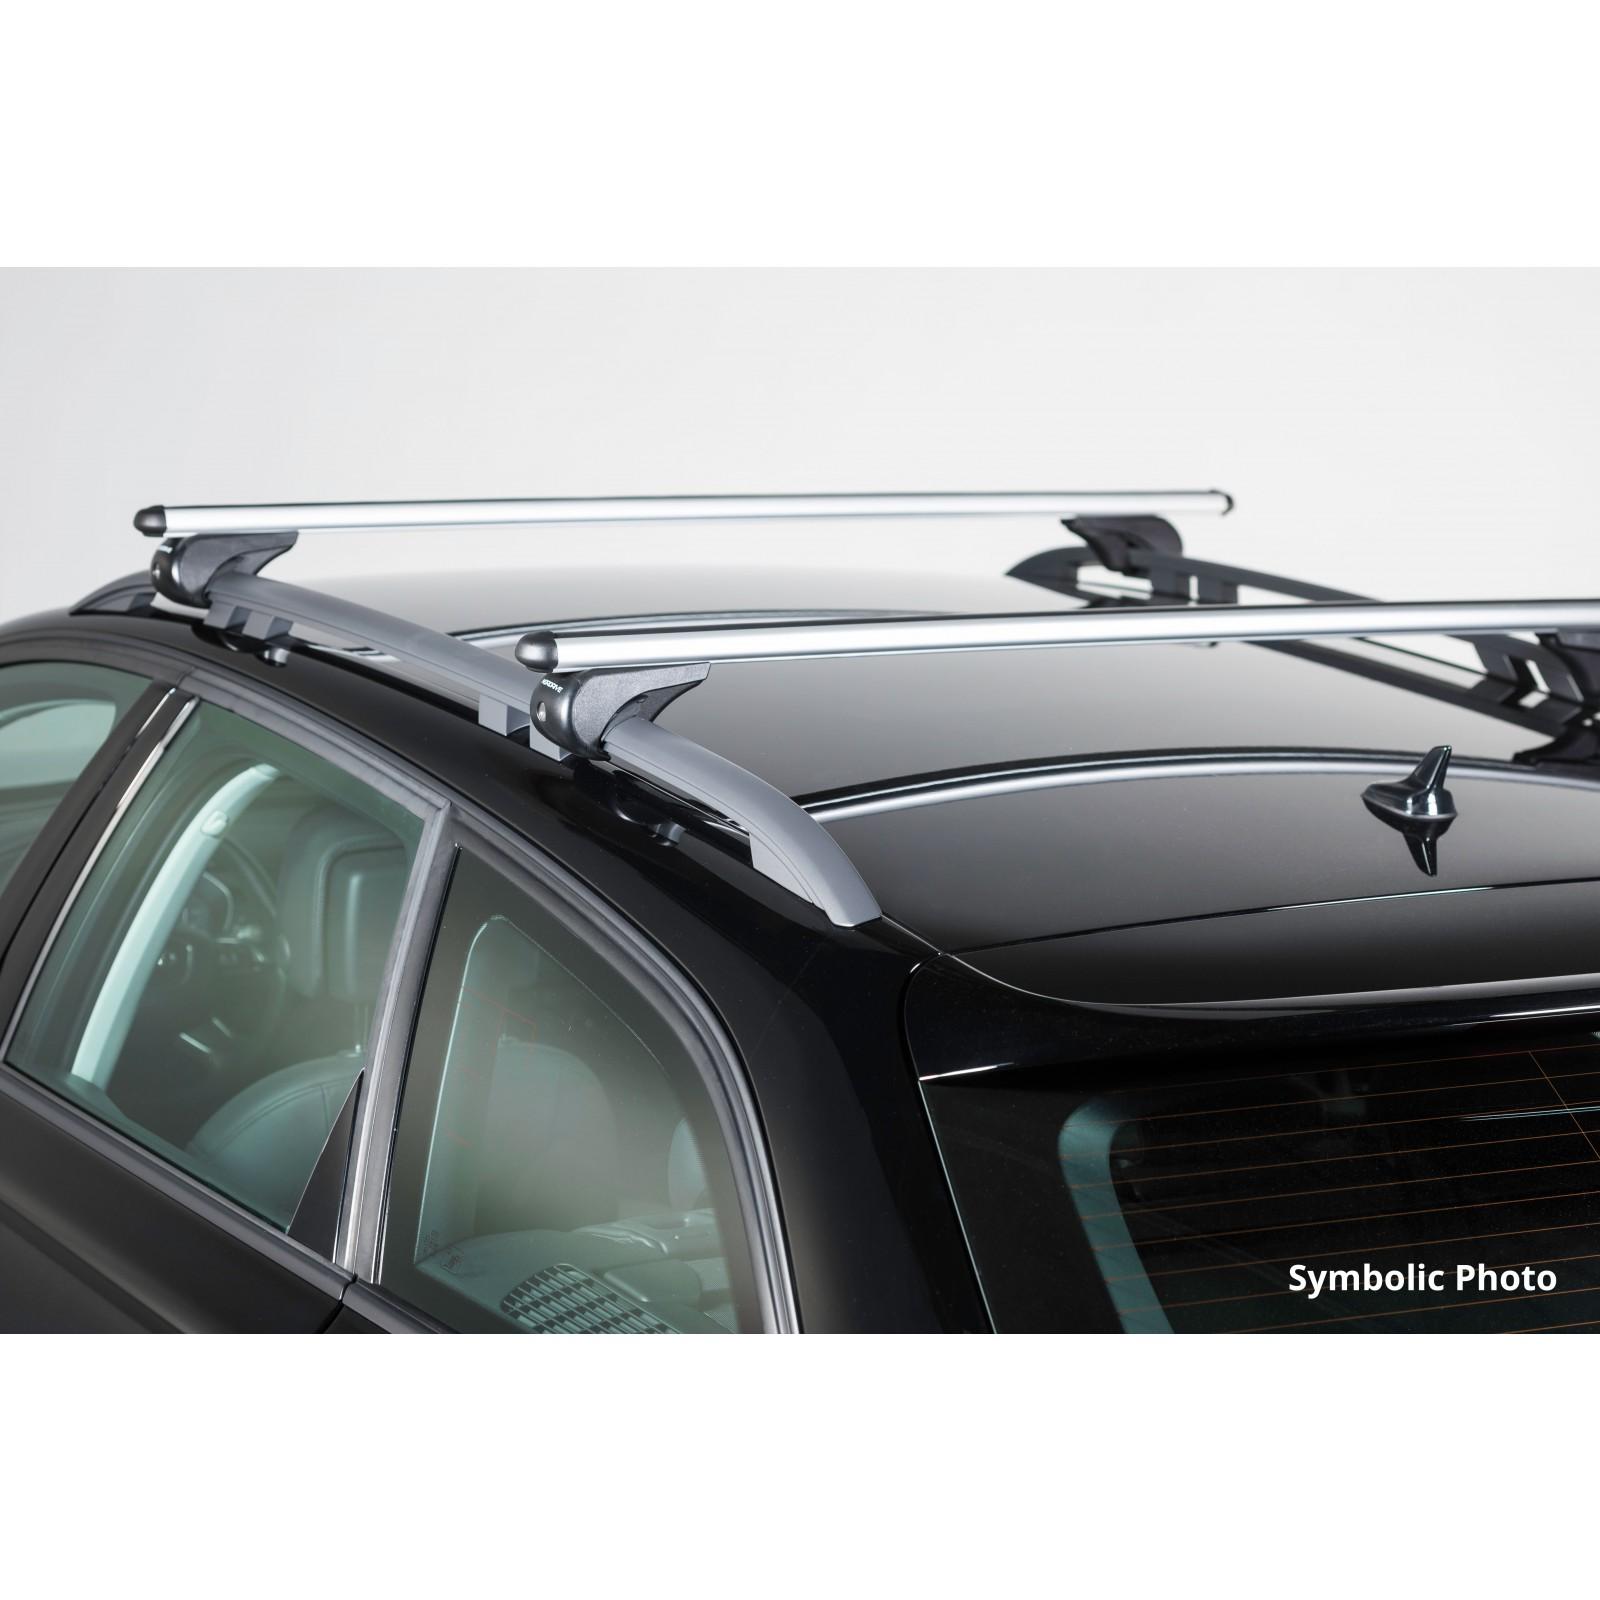 barres de toit en aluminium pour volkswagen tiguan 120cm. Black Bedroom Furniture Sets. Home Design Ideas